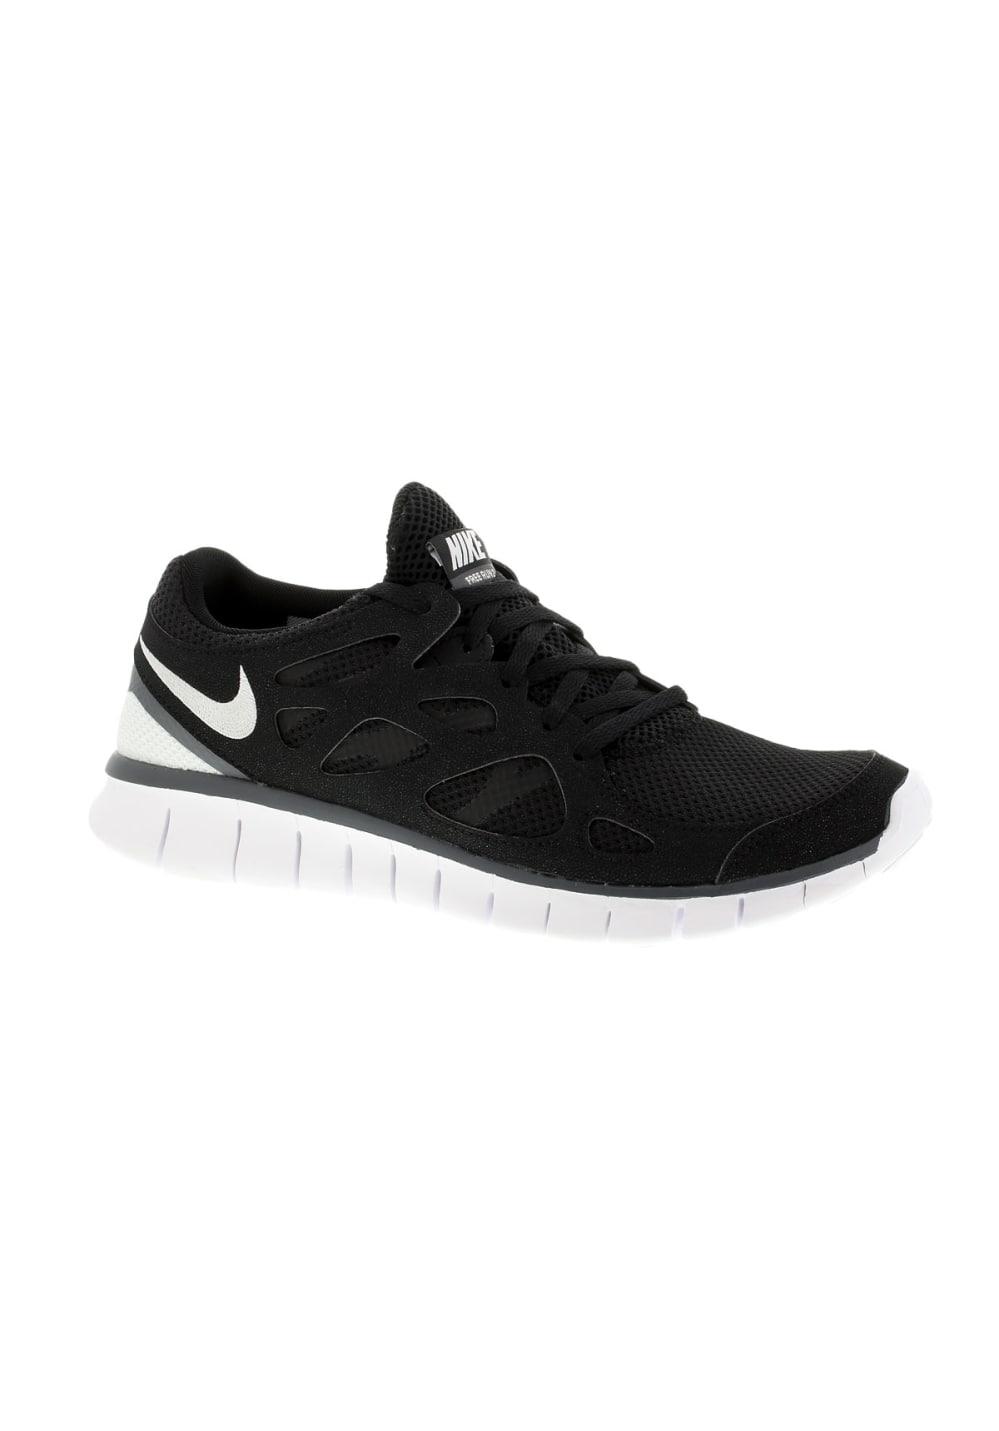 Nike Free Run 2 EXT - Laufschuhe für Damen - Schwarz